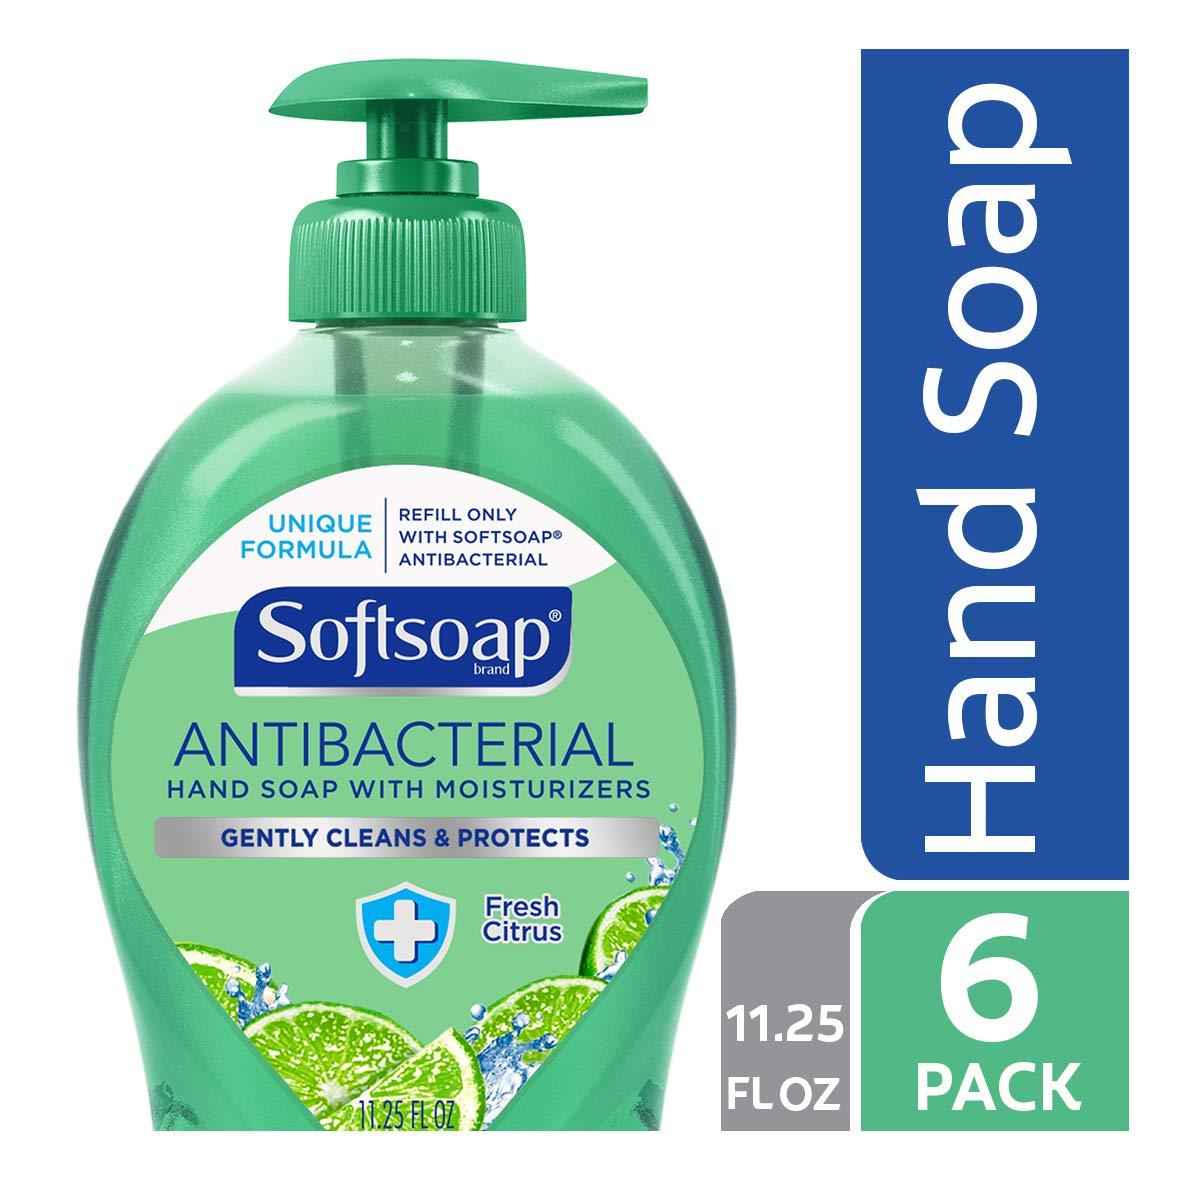 Softsoap Antibacterial Liquid Hand Soap, Fresh Citrus - 11.25 fluid ounce (6 Pack)